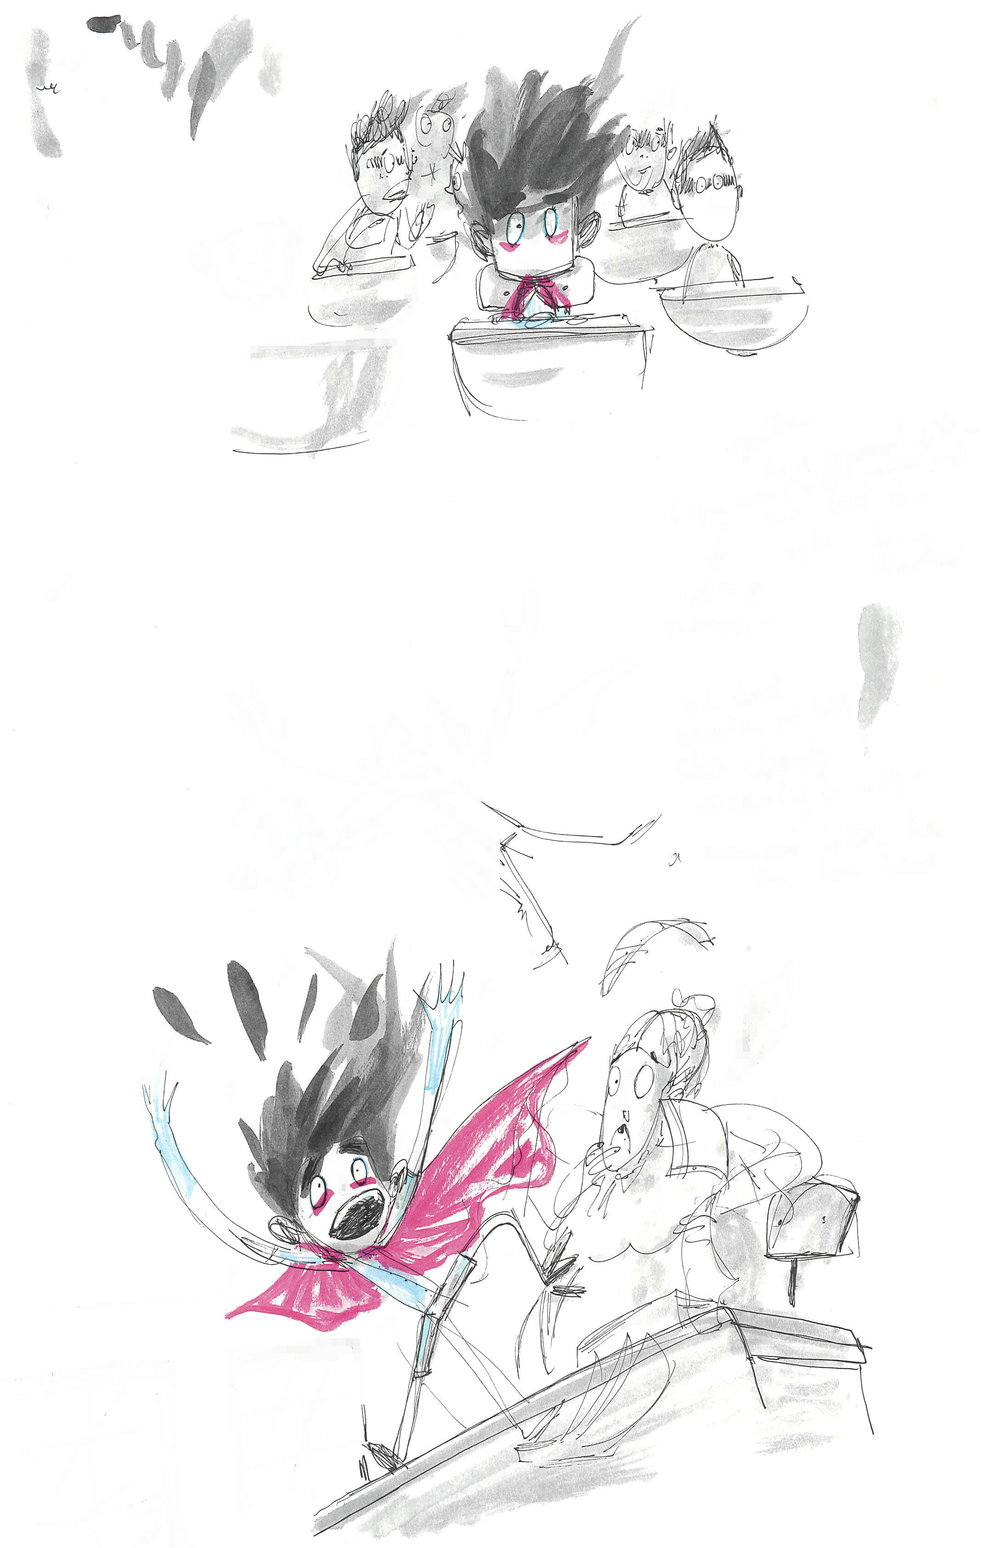 BRIANWONDERS-sketches-1_Page_15_Image_0001.jpg